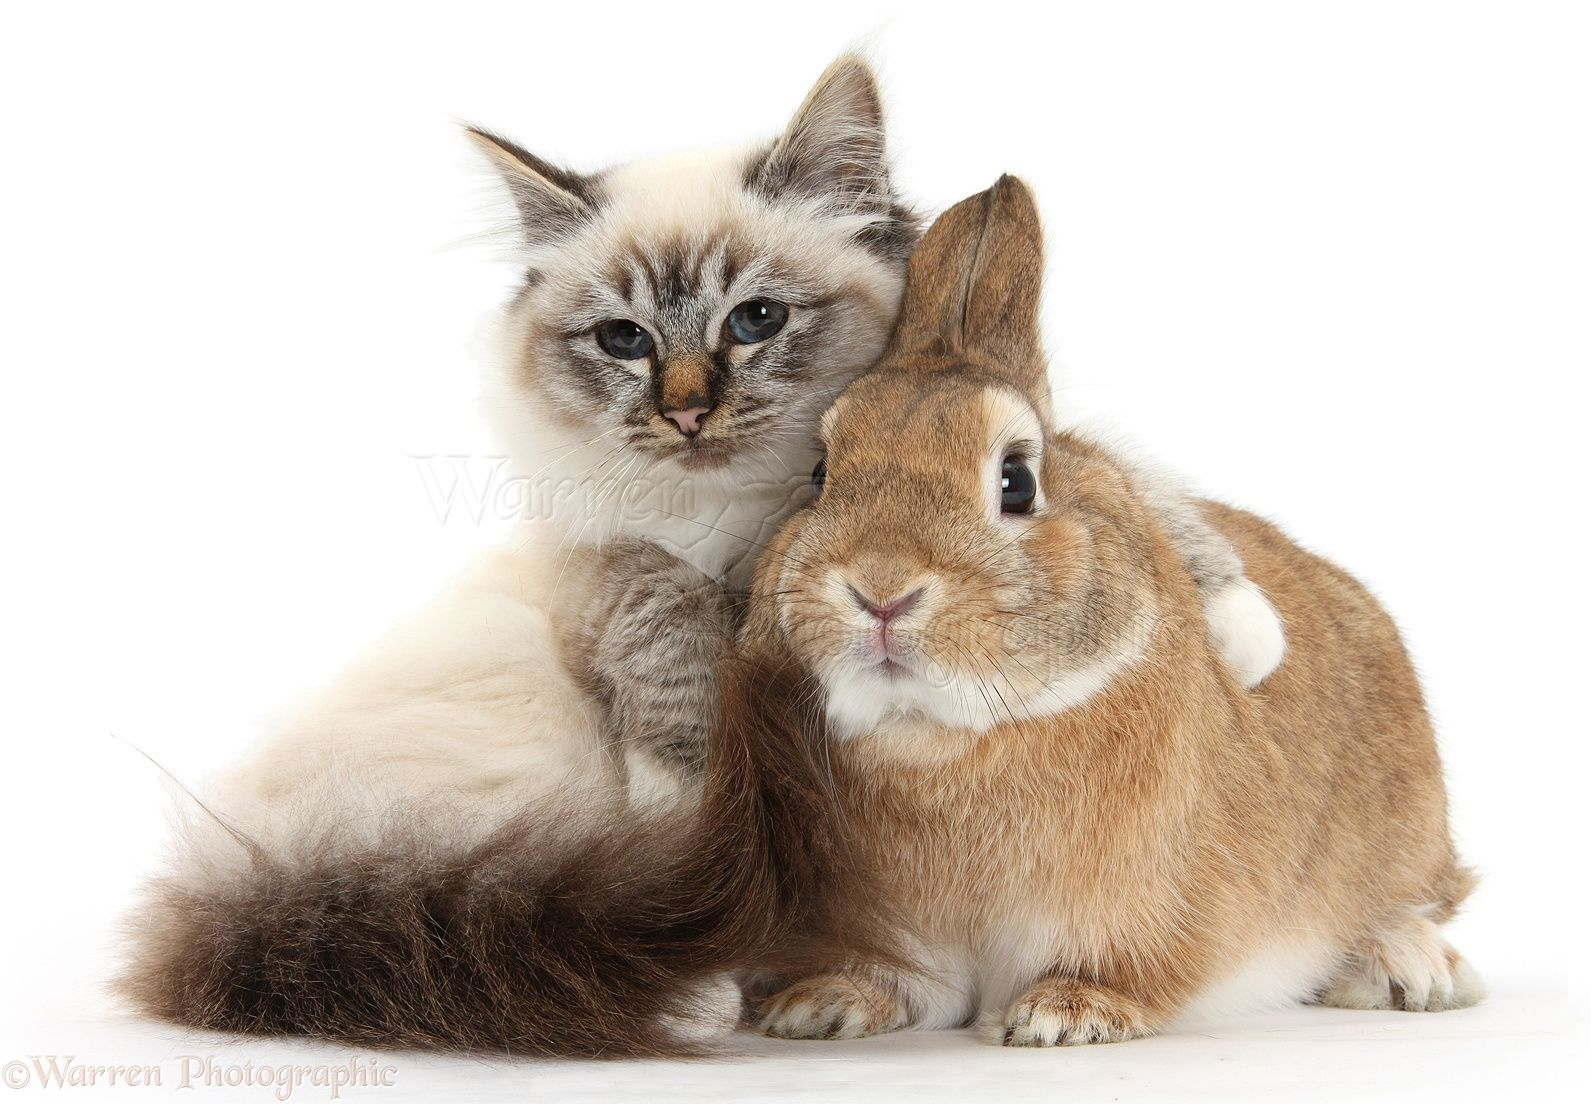 White Background Photograph of Birman Cat and Rabbit